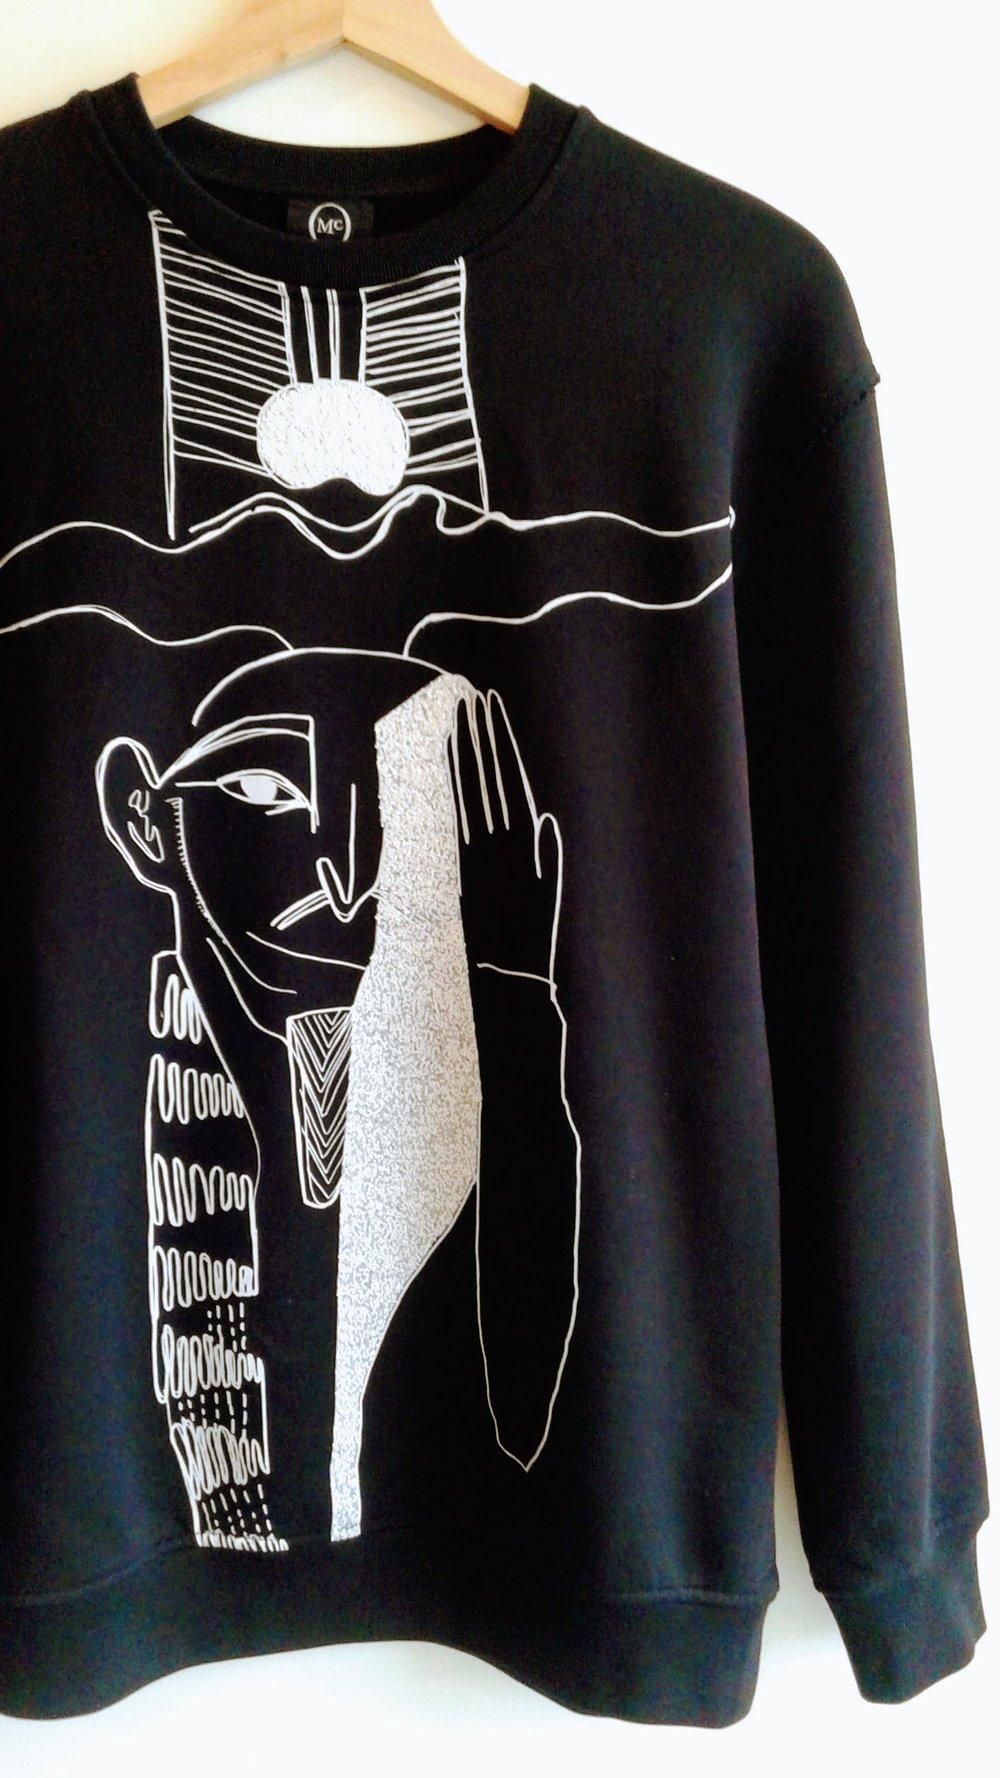 Alexander McQueen sweater; Size M, $165